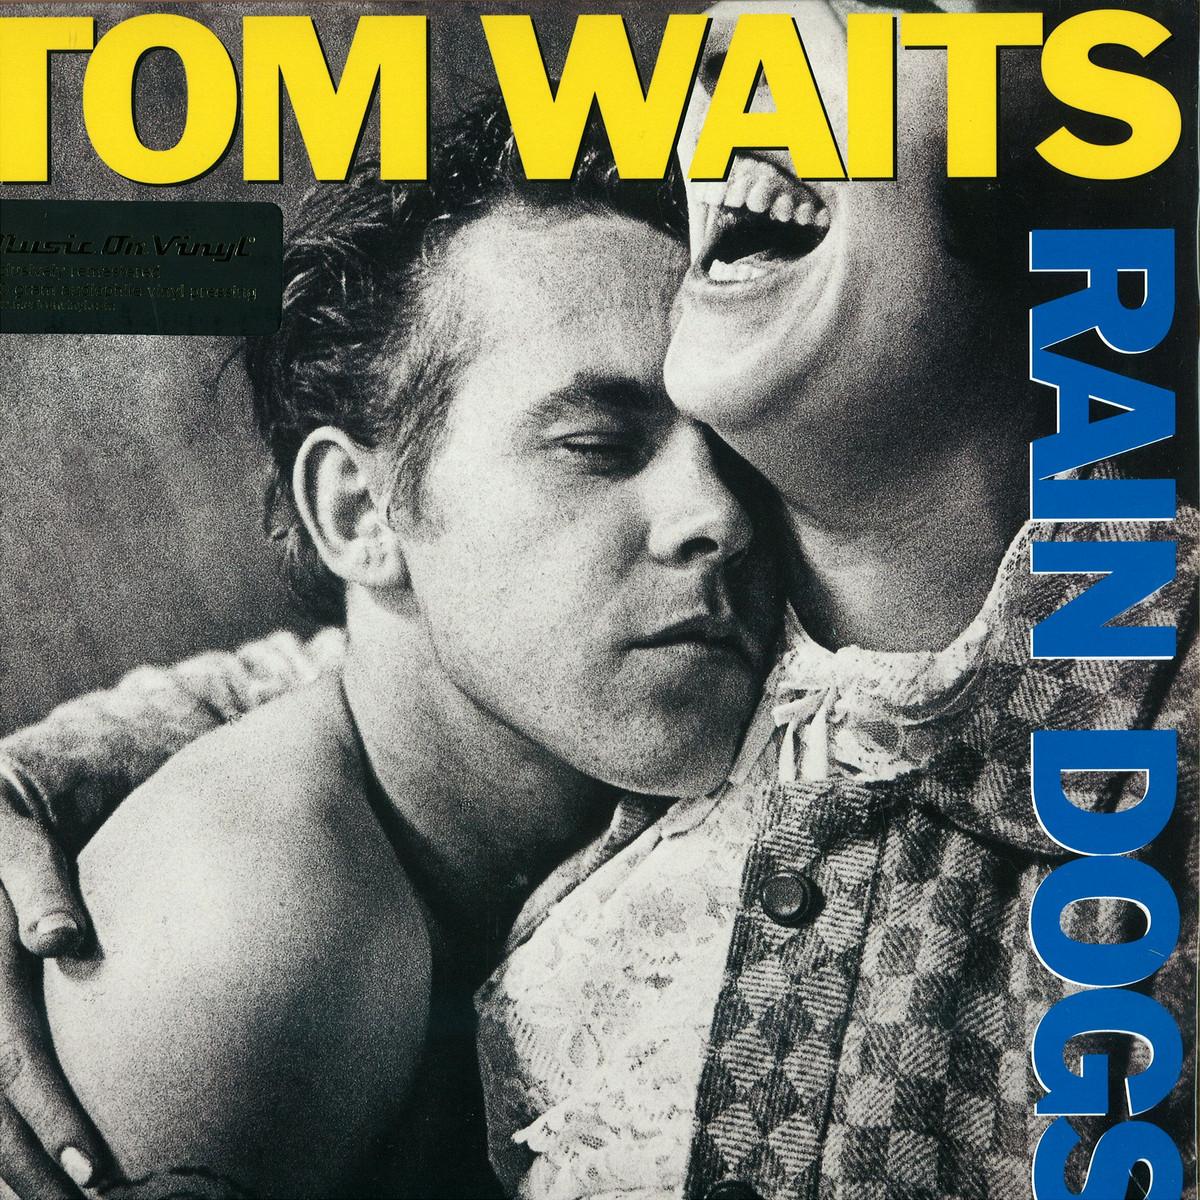 Tom Waits Rain Dogs Music On Vinyl Movlp393 Vinyl